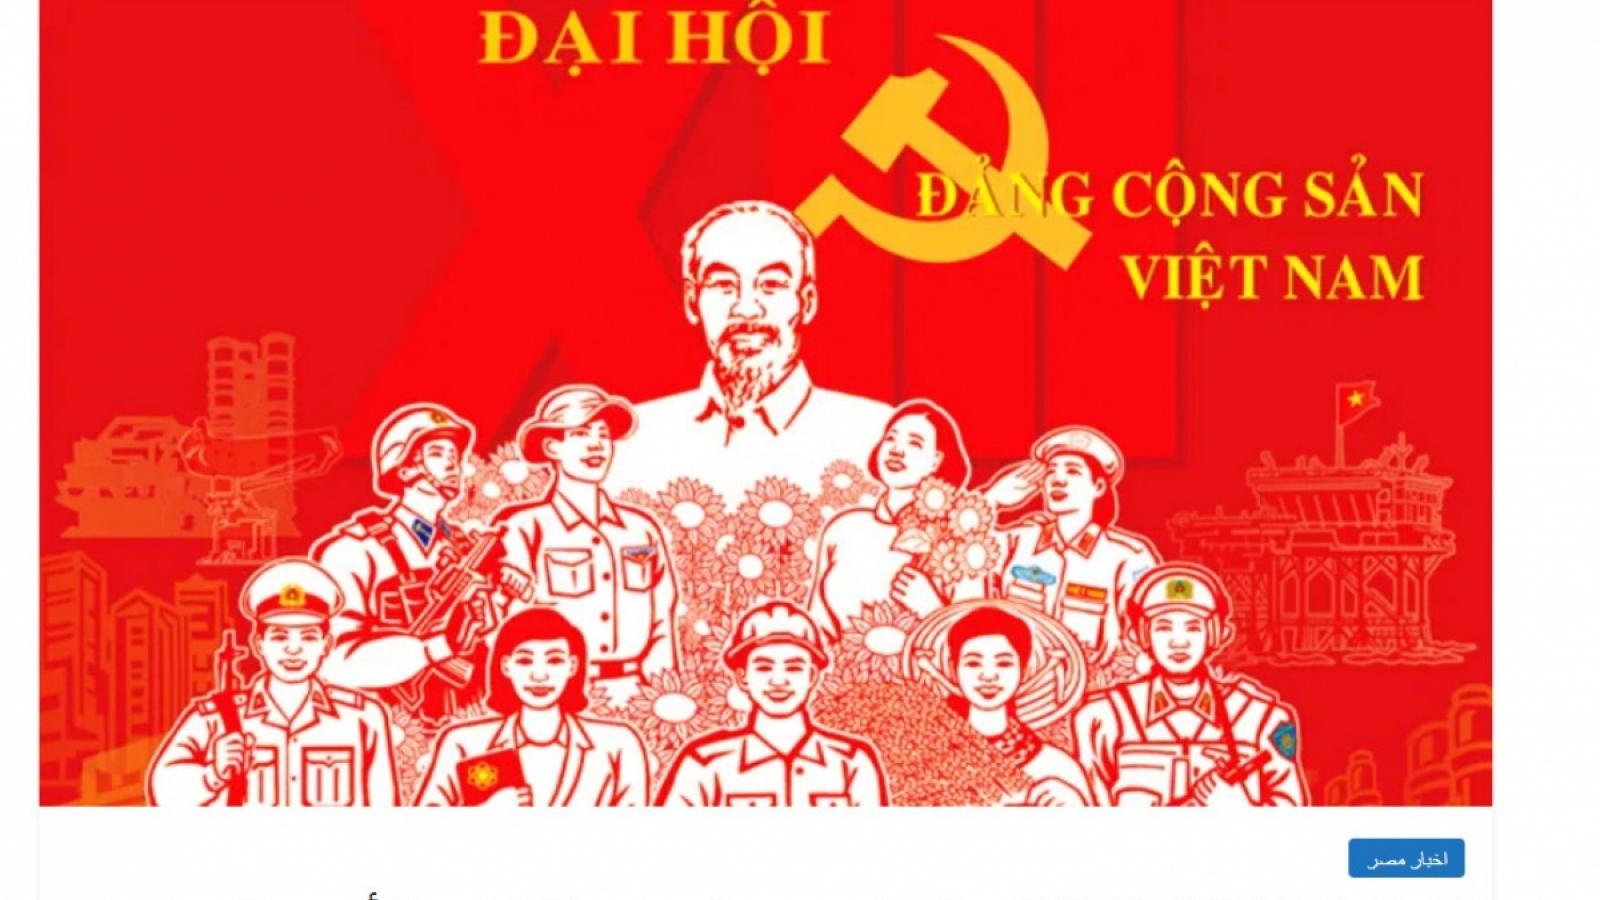 Vietnam's Renewal achievements grab Egyptian headlines